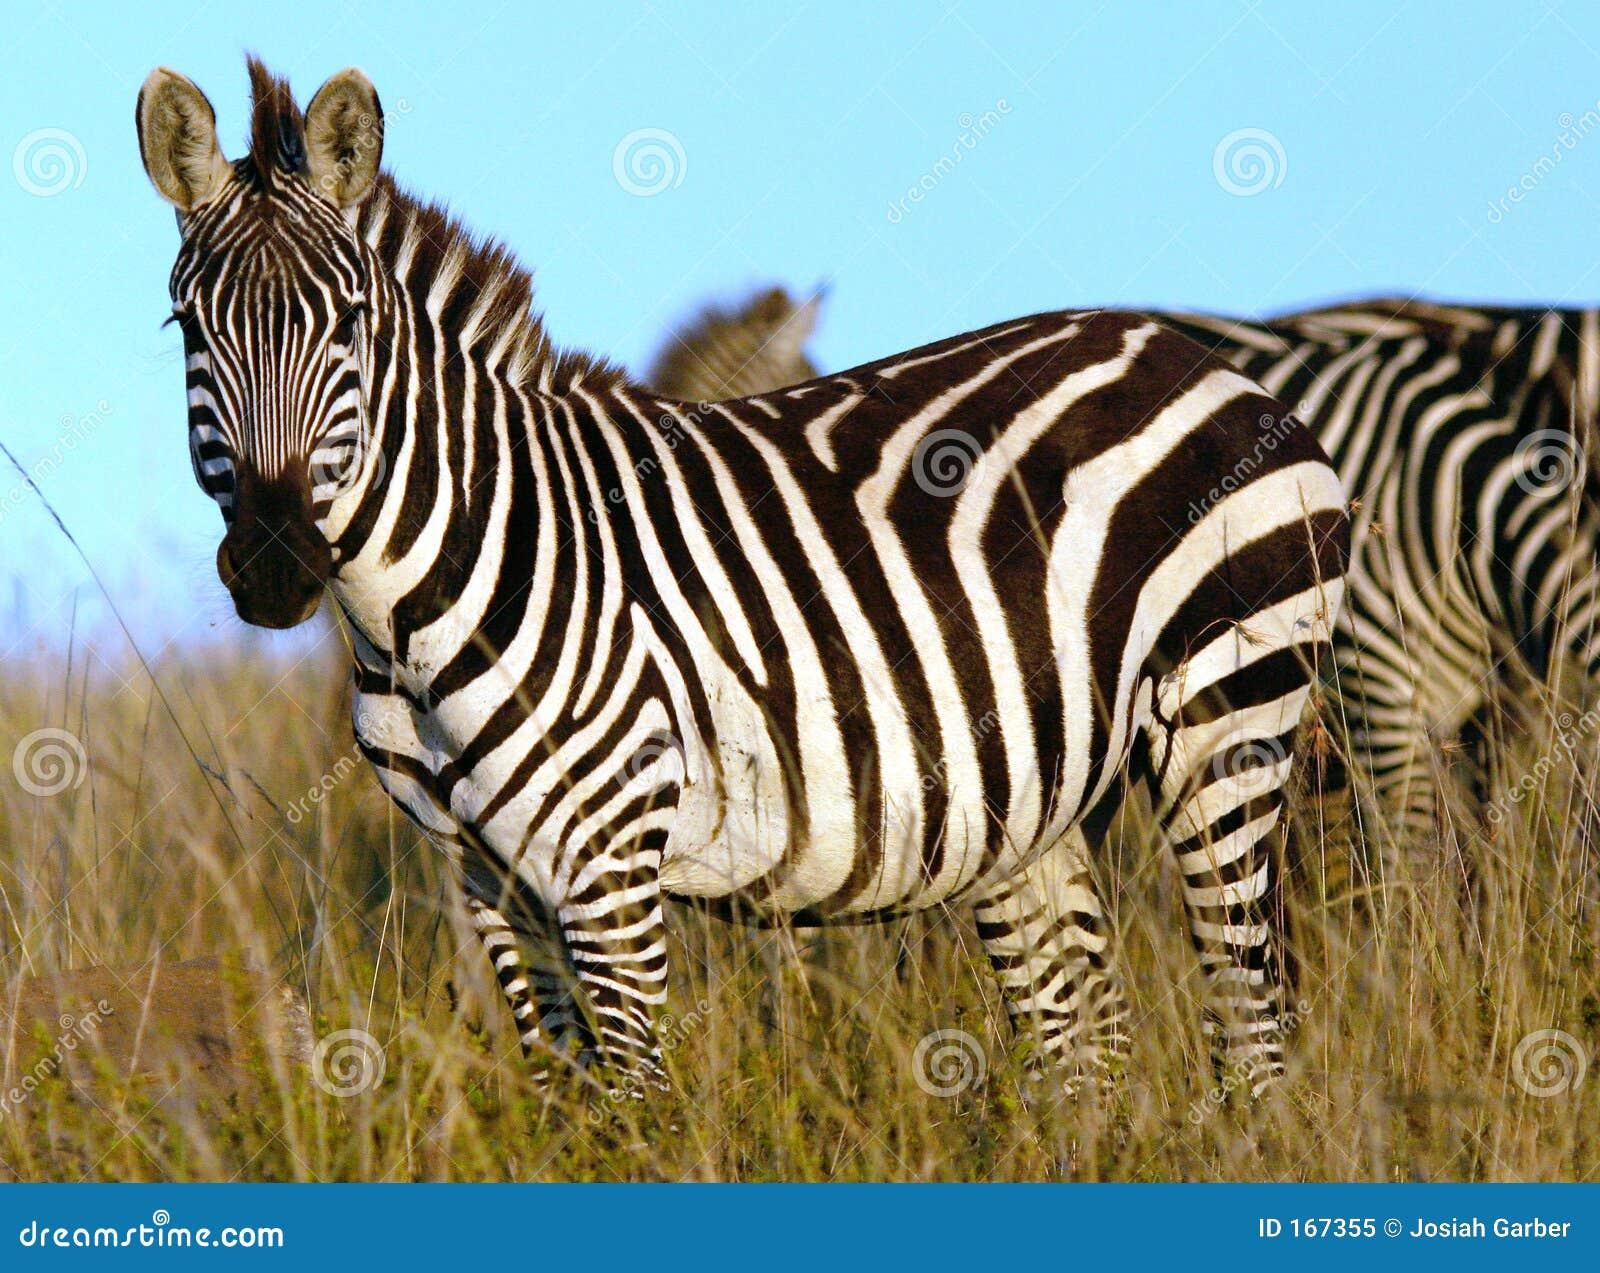 Zebra In Africa Royalty Free Stock Photo - Image: 167355